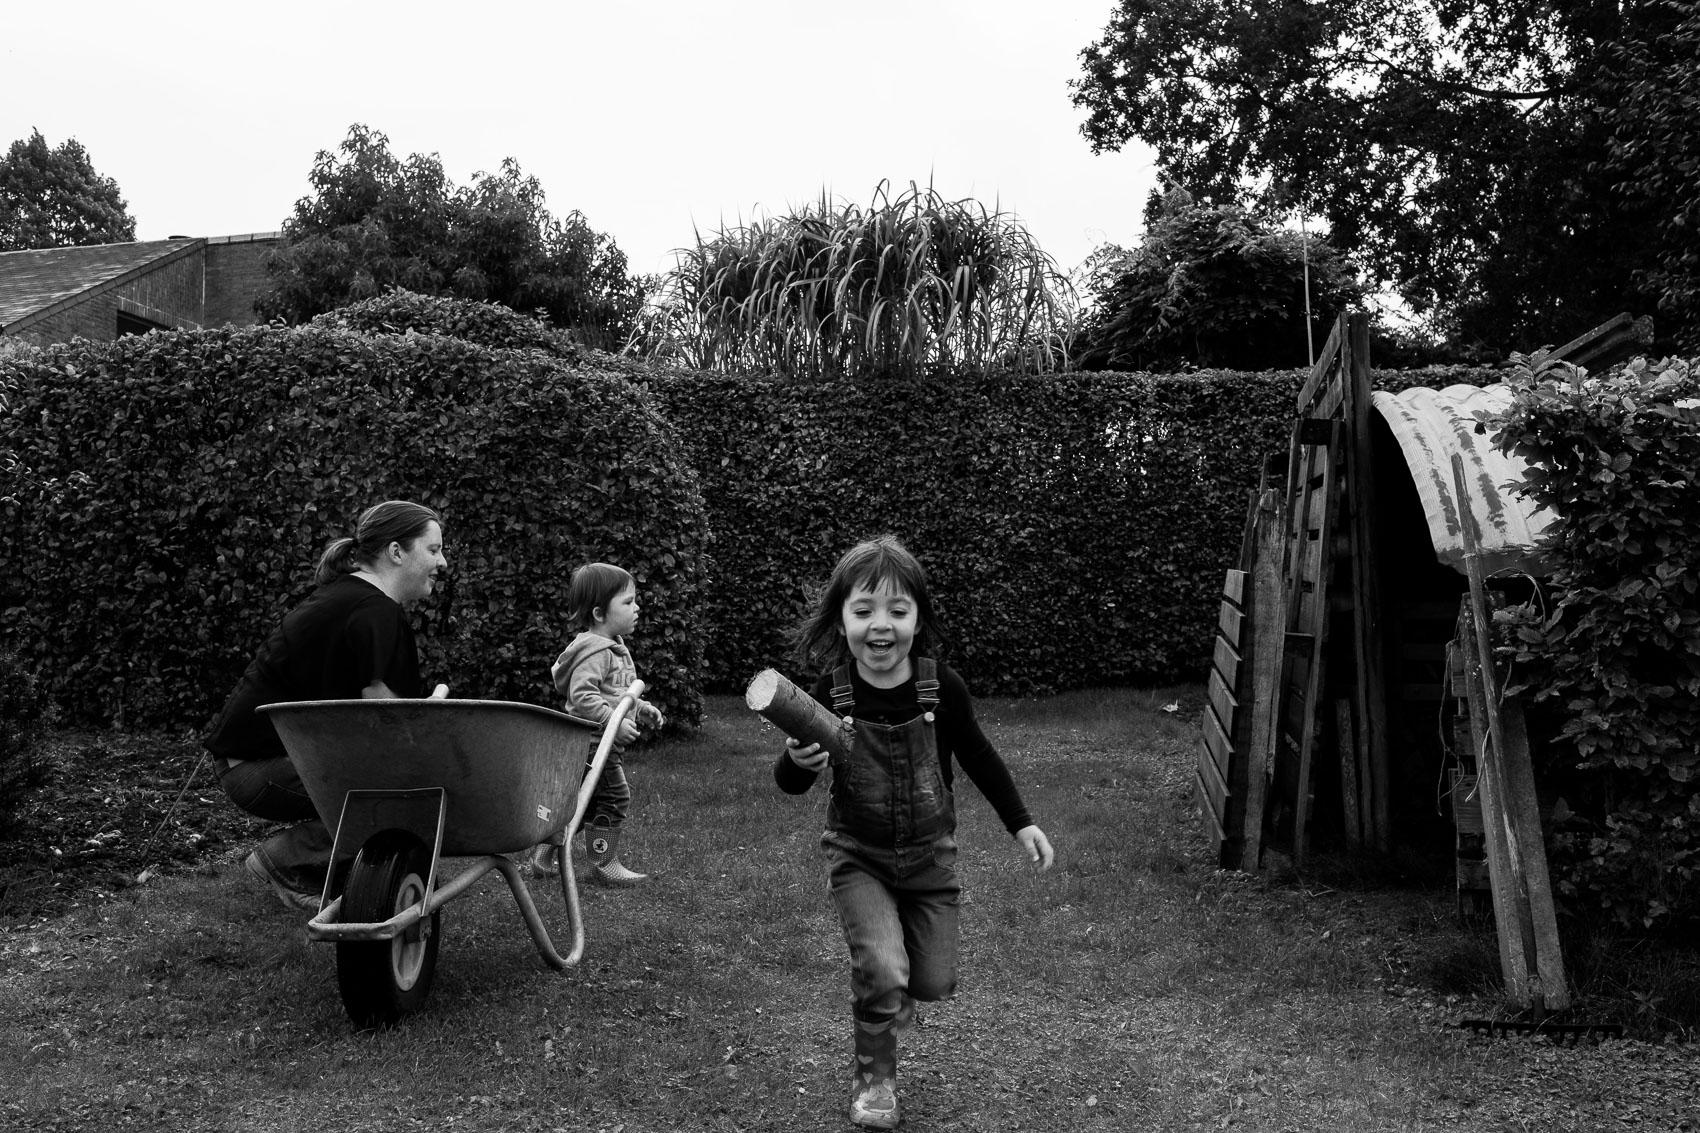 familiefoto familiefotograaf family photographer day in the life kinderen children iso800 fotografie Leuven